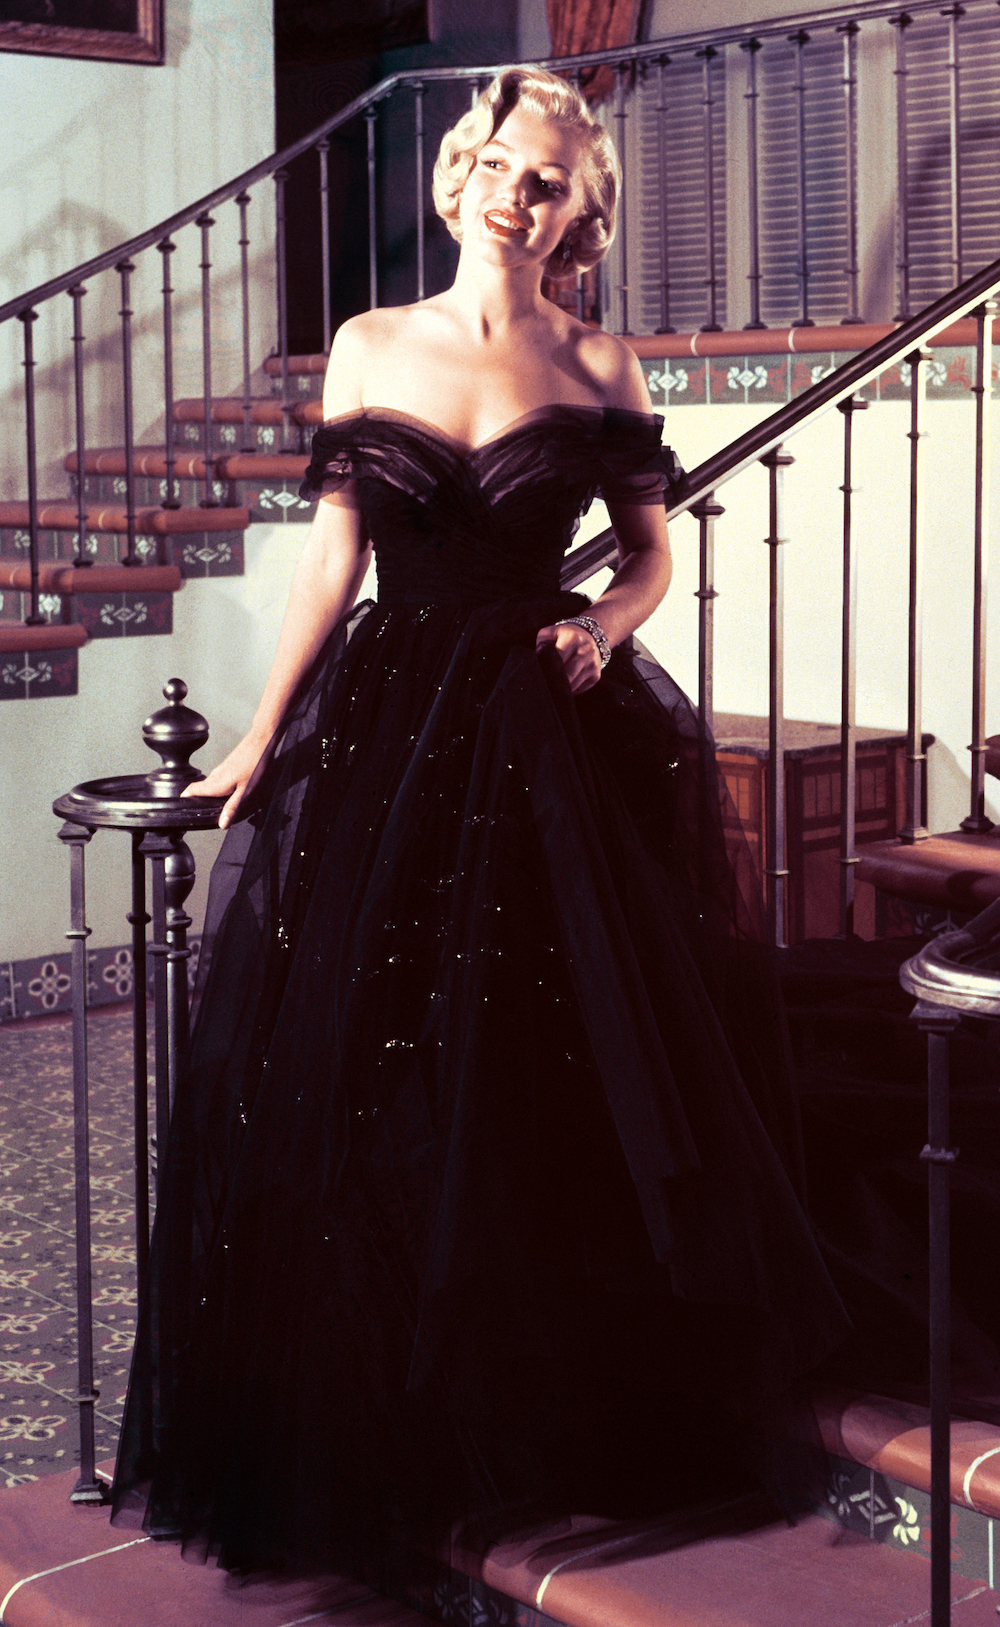 A propósito del dress code de los Golden Globes: Los mejores trajes en negro de las premiaciones